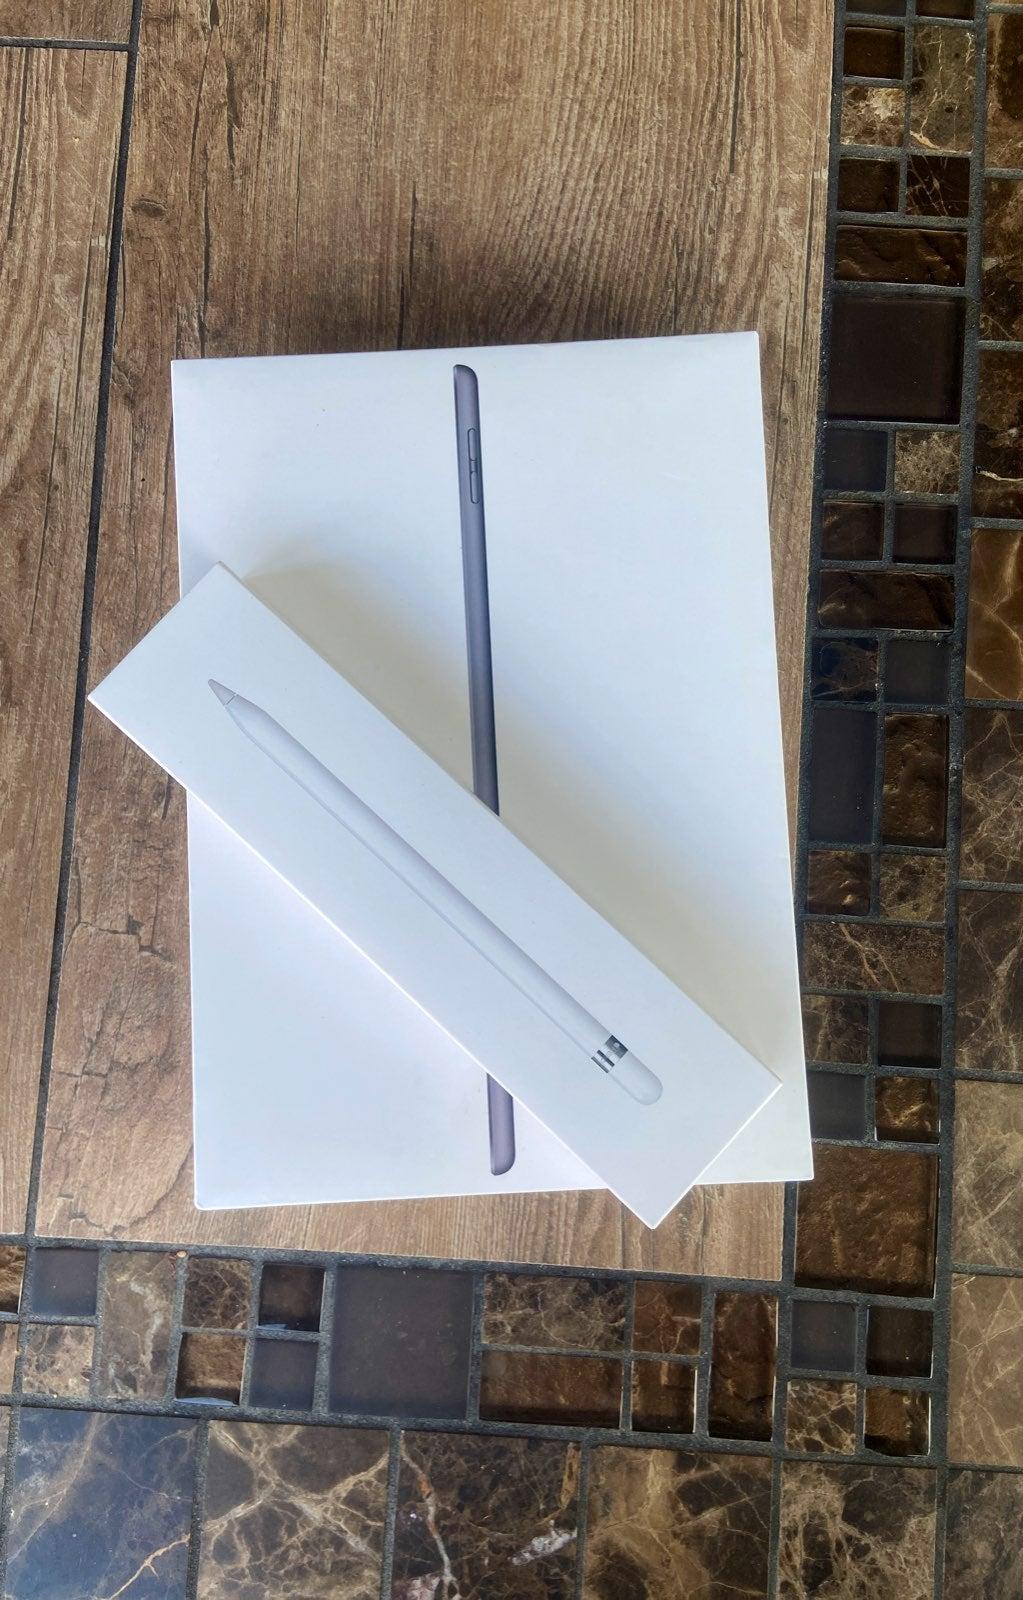 iPad (7th Gen) and Apple Pencil (1st Gen